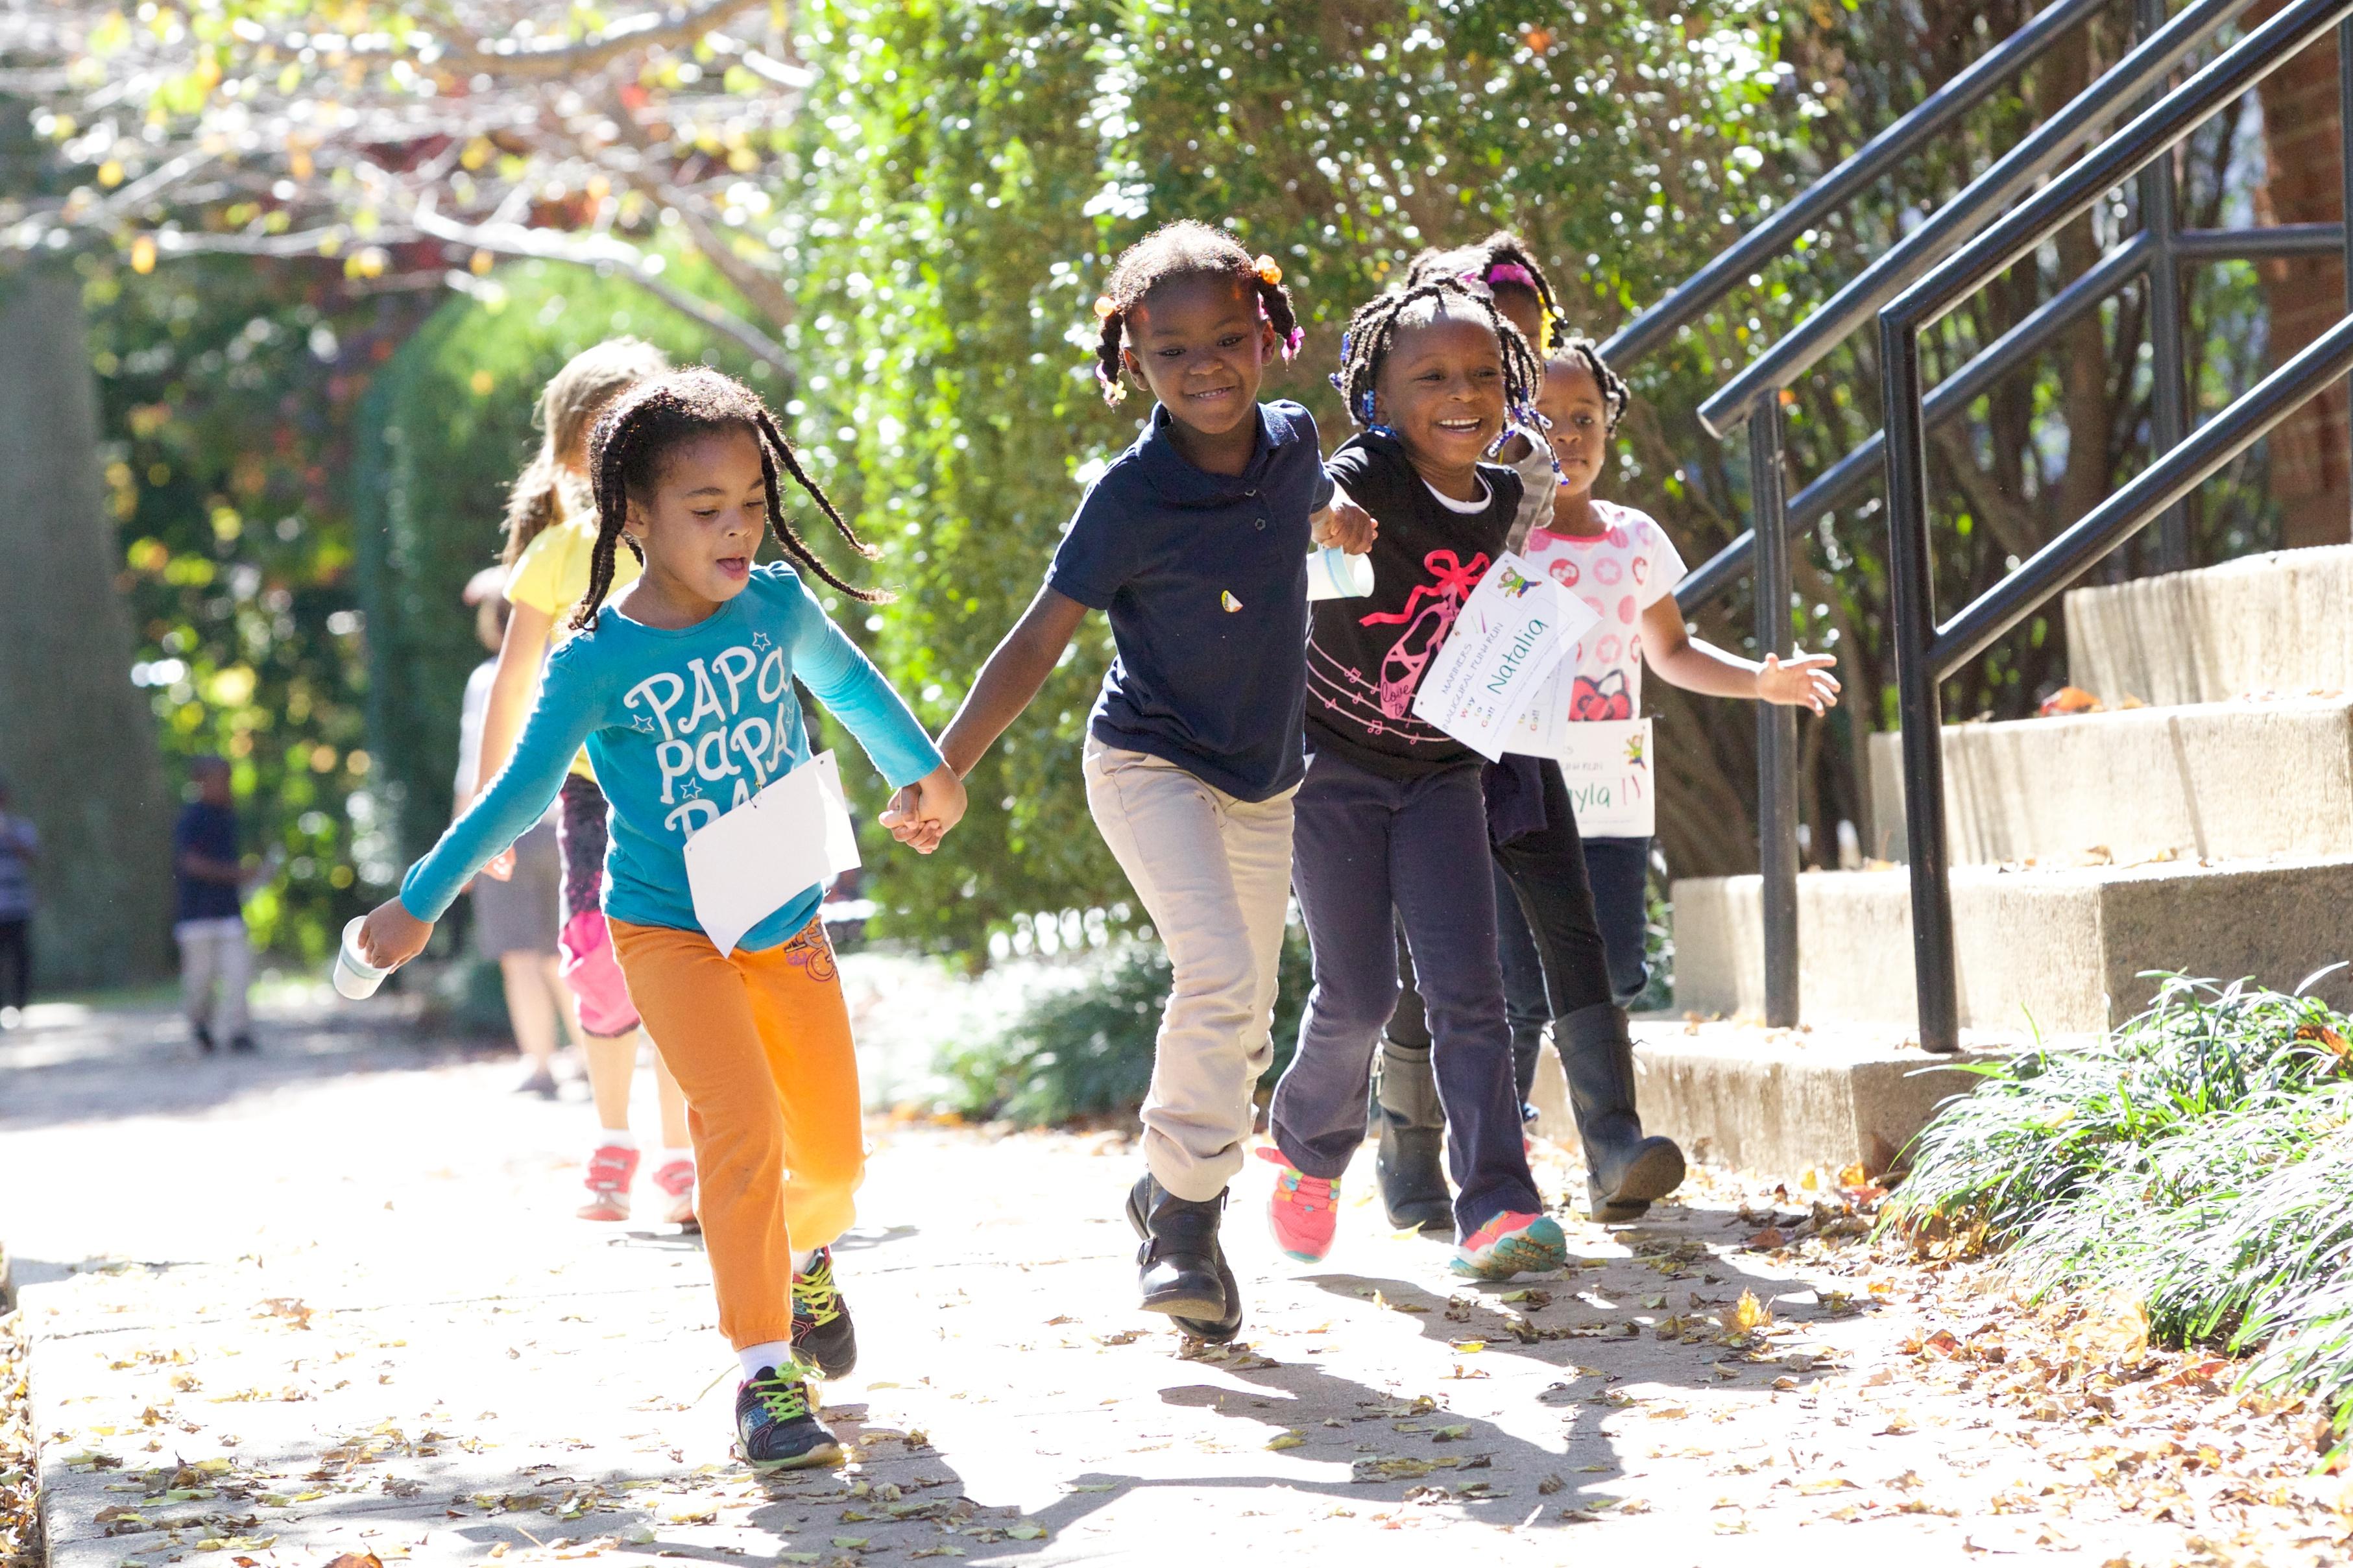 Kids skipping outside